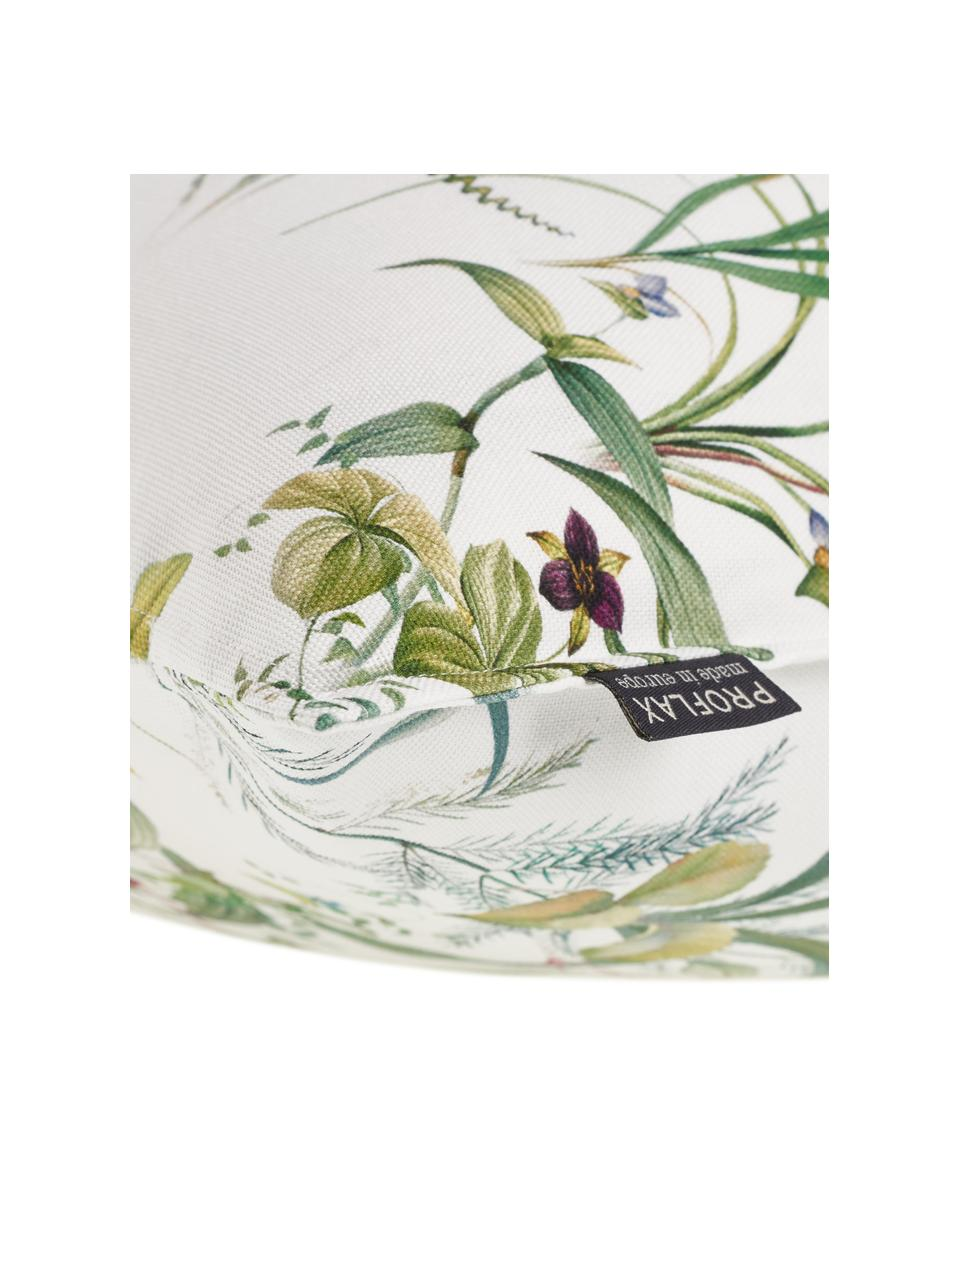 Kissenhülle Anjuli mit Blümchenprint, 100% Baumwolle, Weiß, Mehrfarbig, 40 x 40 cm